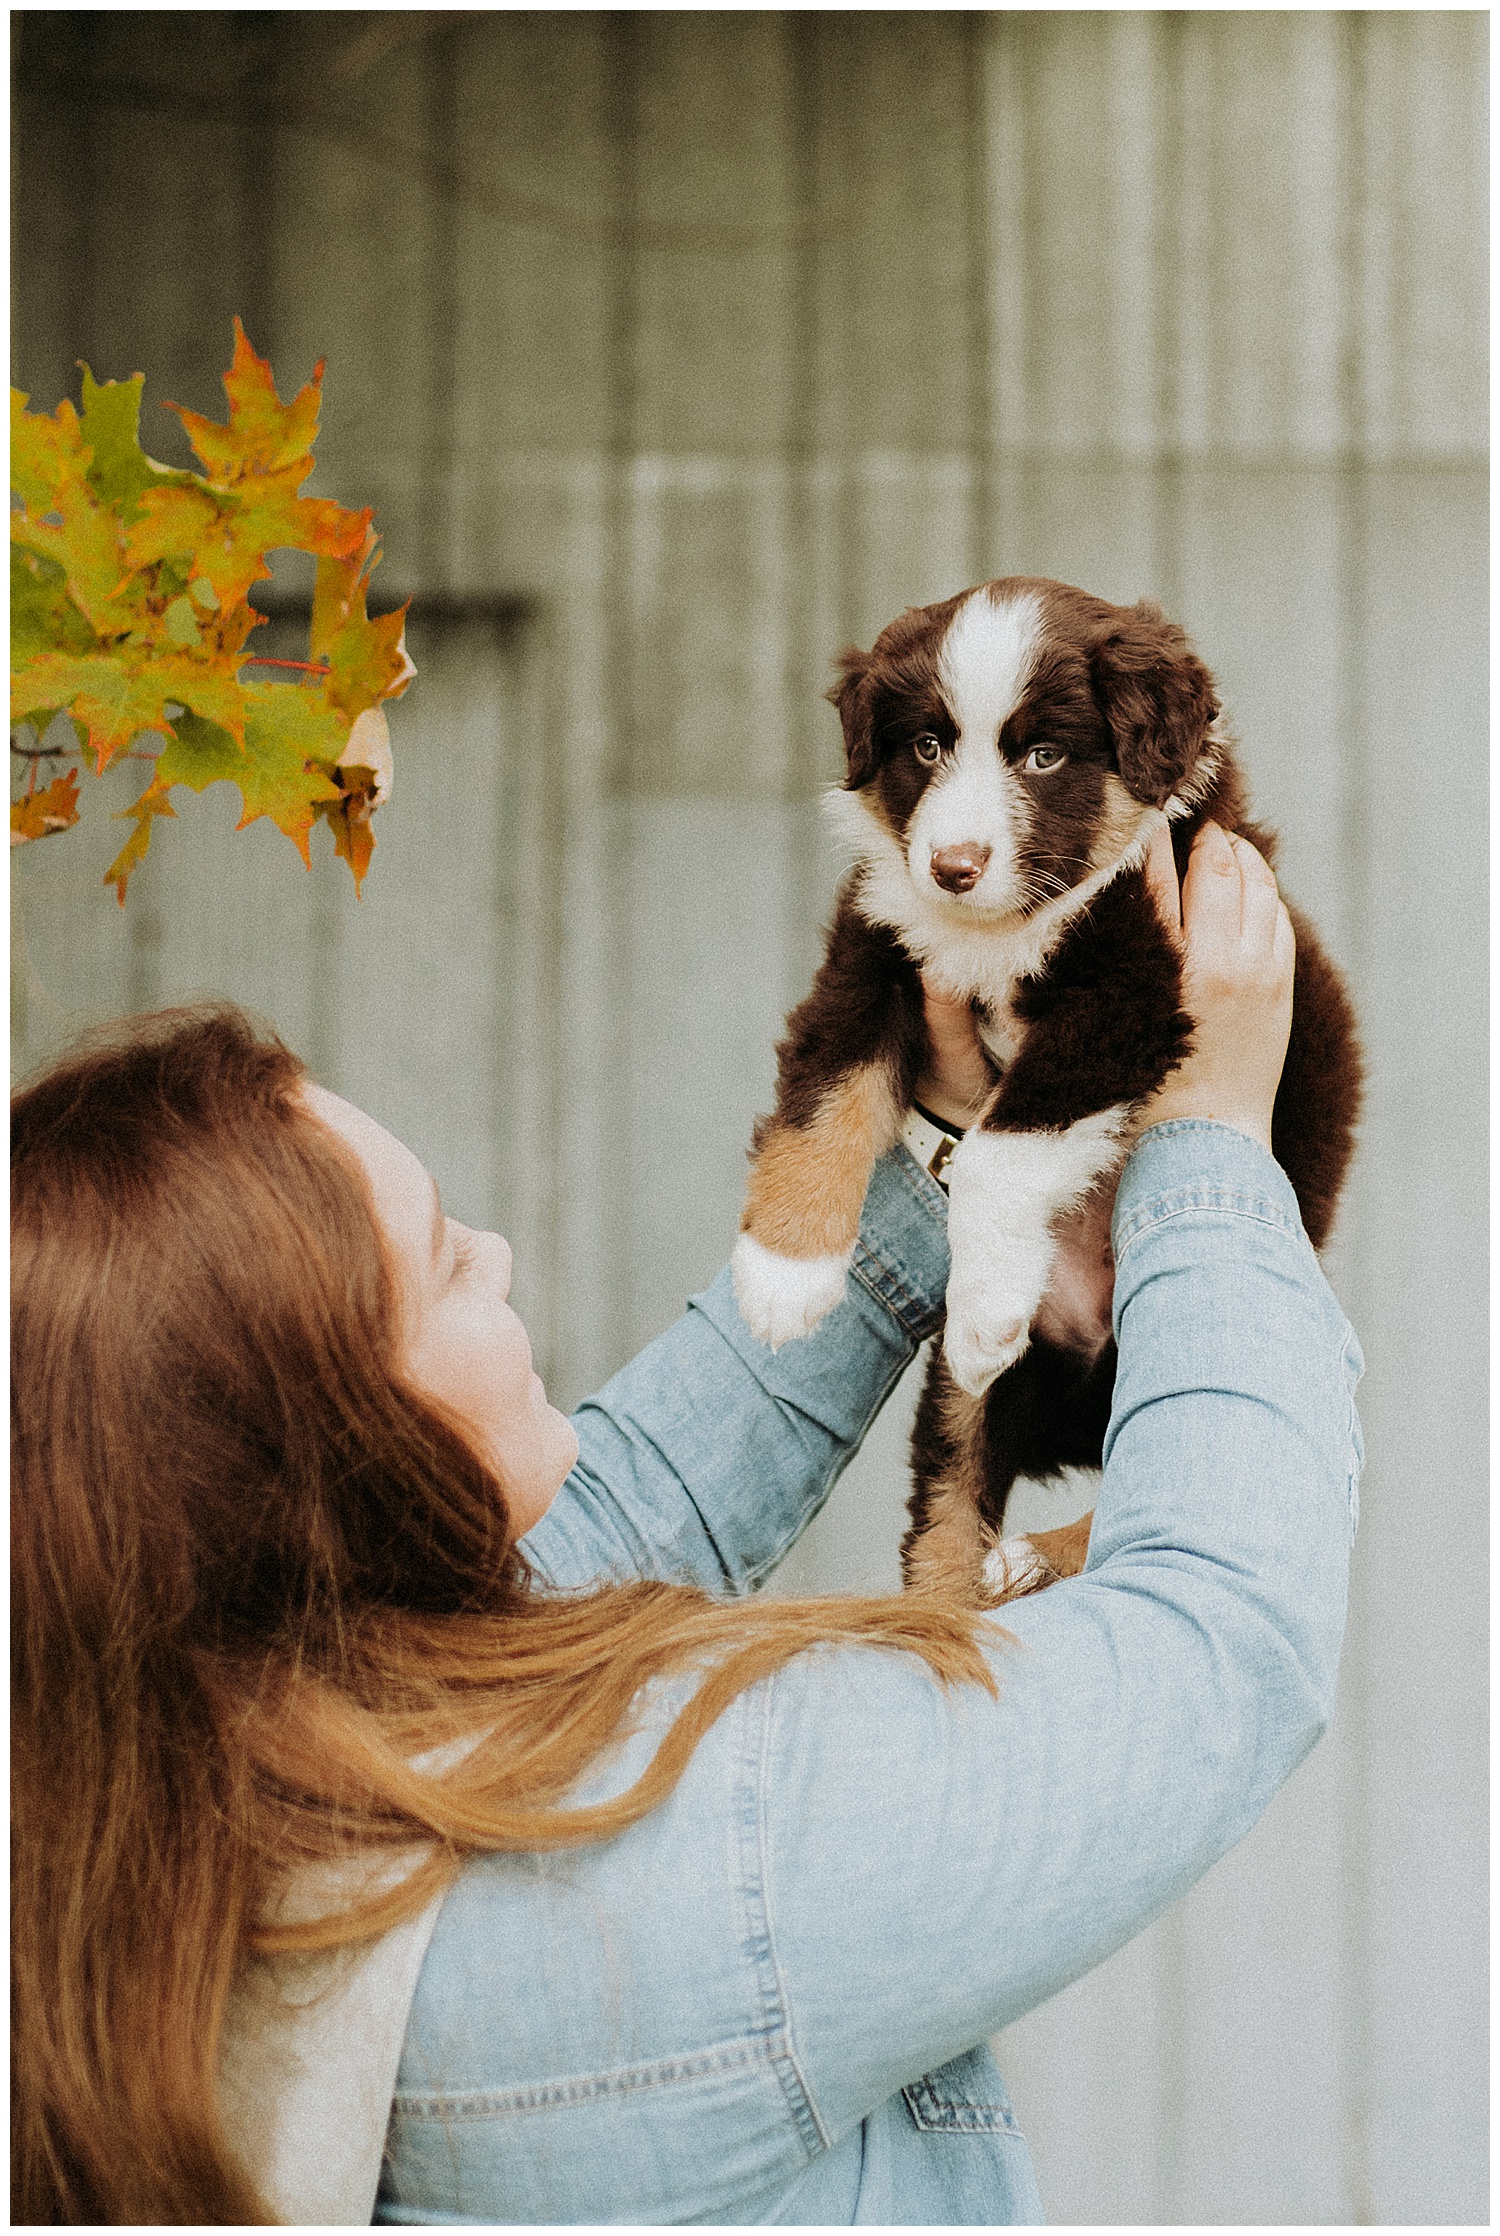 Holly McMurter Photographs | Prince Edward County | Fall Mini Session_0006.jpg